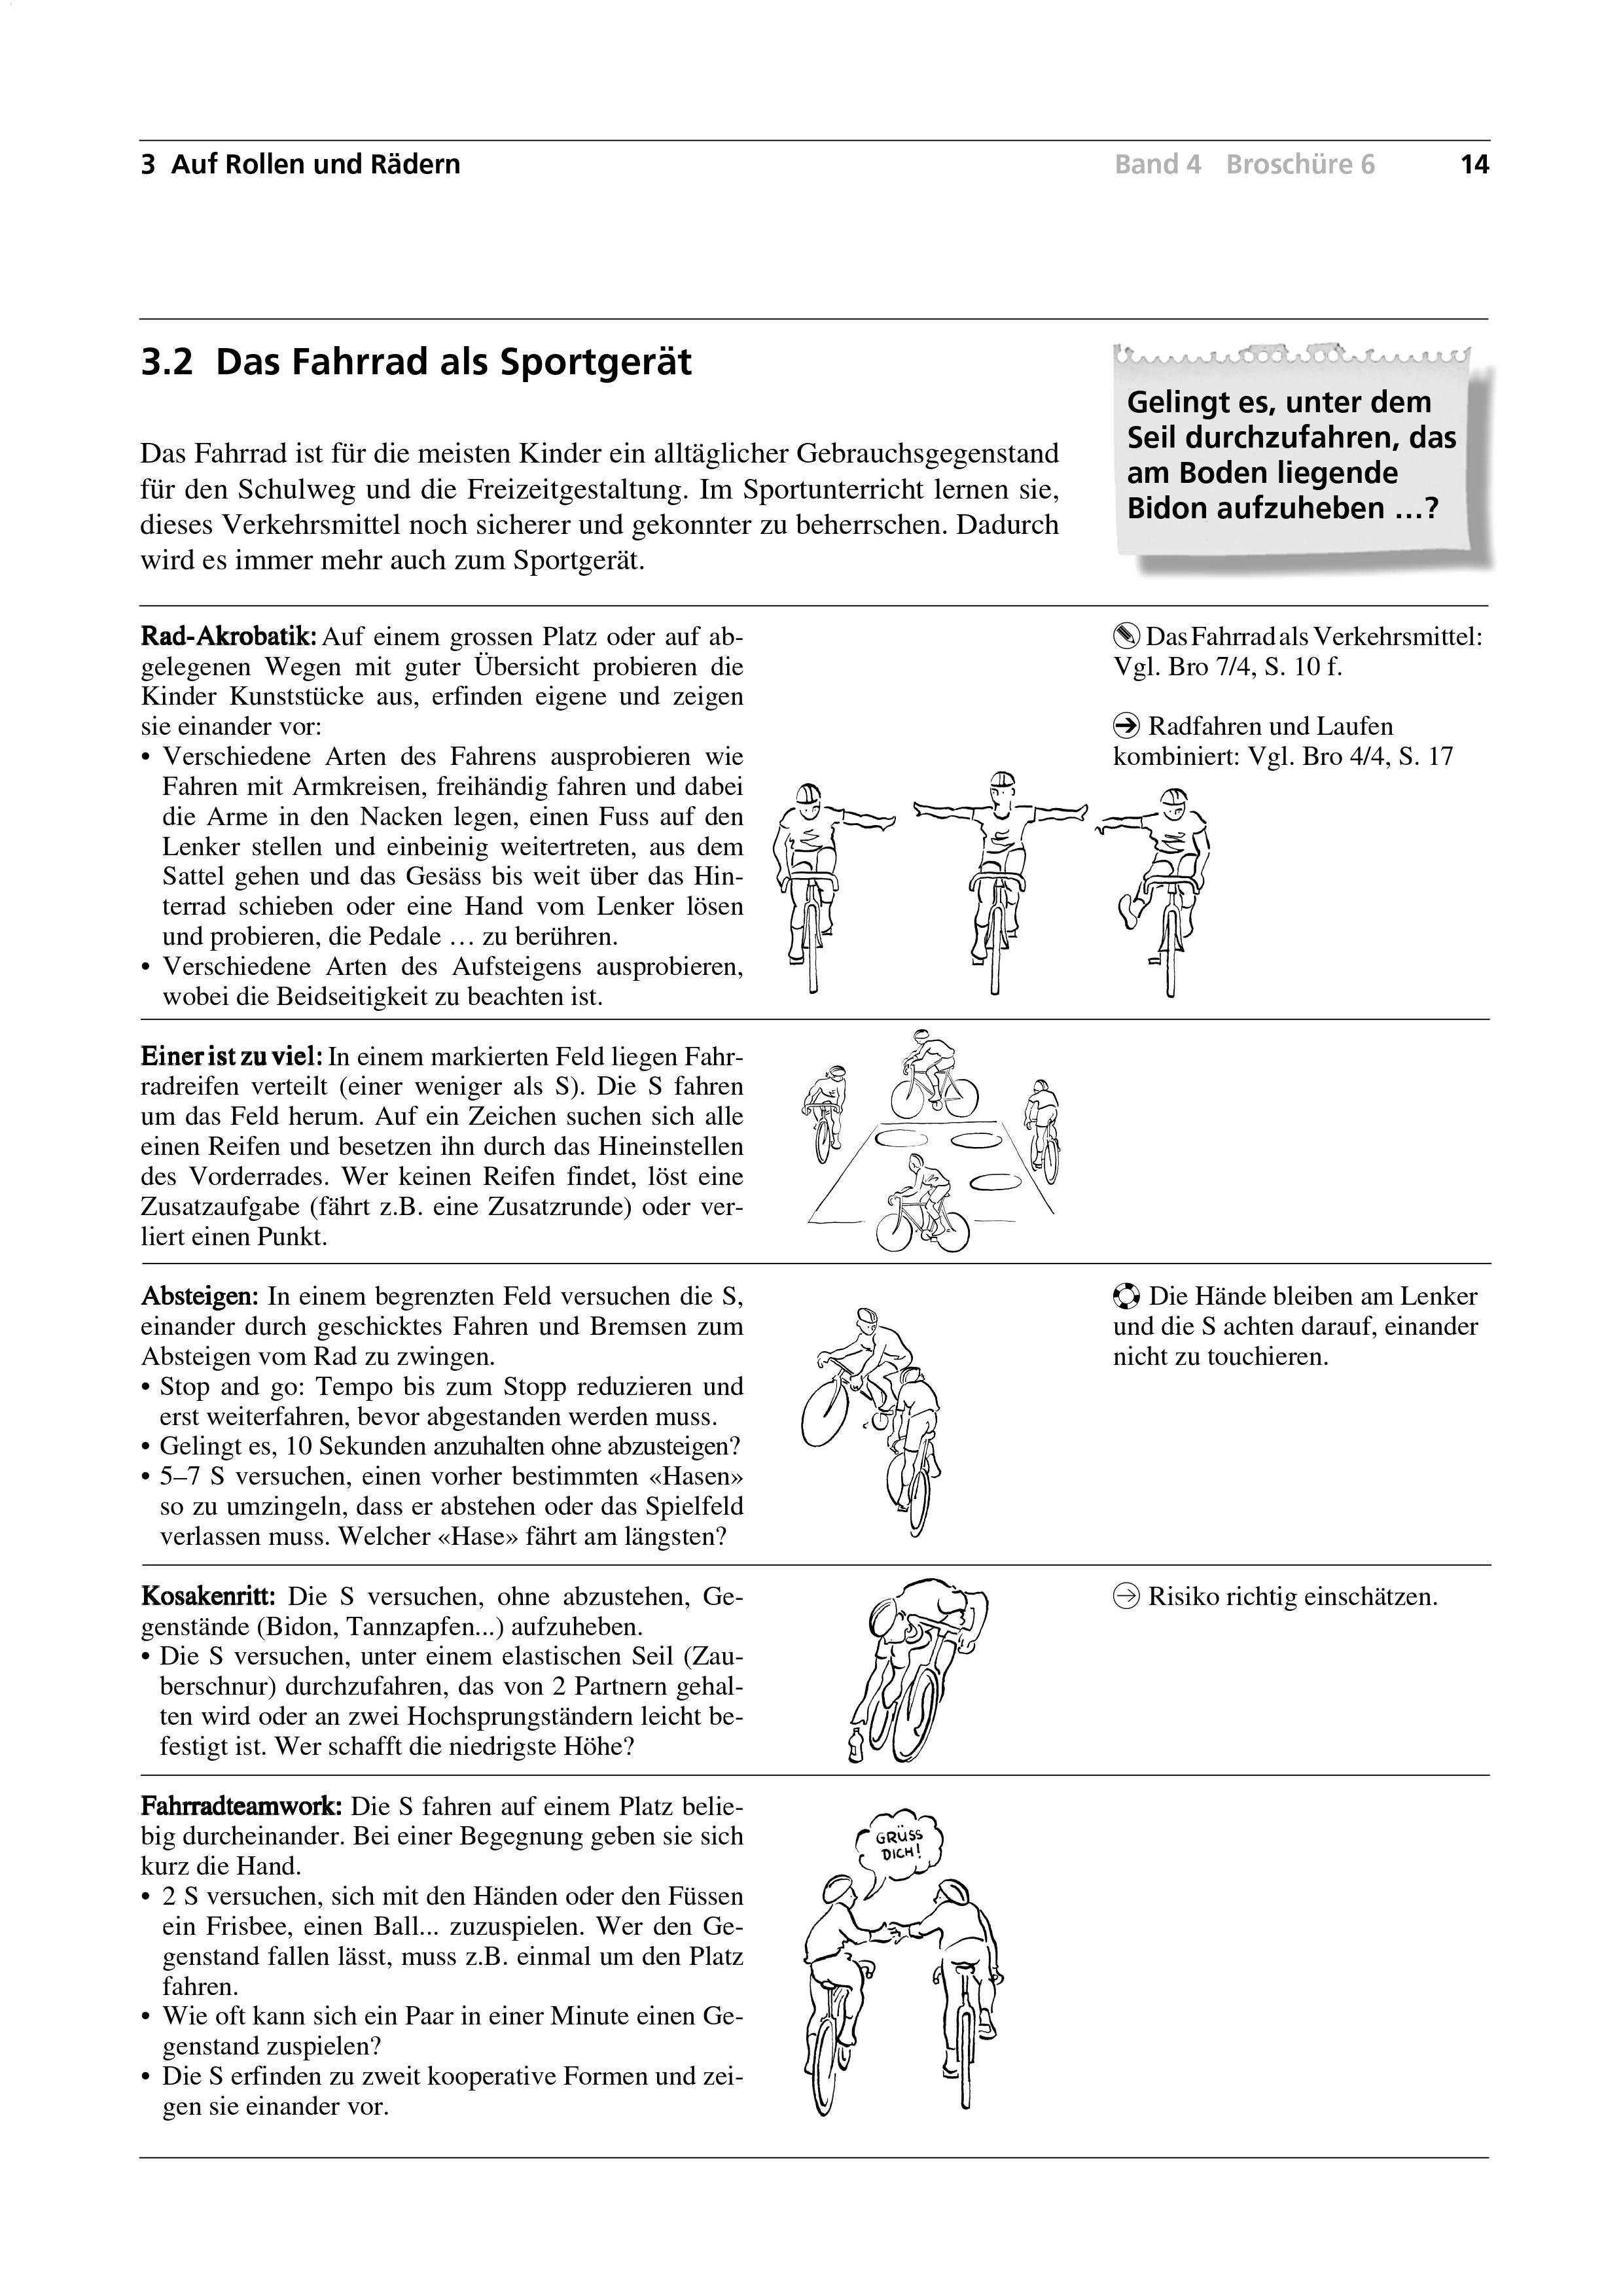 Preview image for LOM object Das Fahrrad als Sportgerät